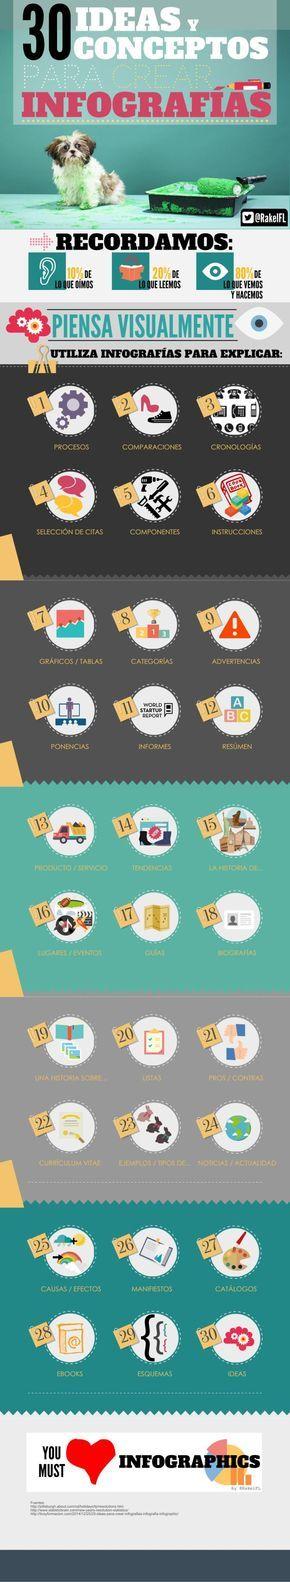 30 IDEAS Y CONCEPTOS PARA CREAR INFOGRAFÍAS #INFOGRAFIA #INFOGRAPHIC #MARKETING… Más #infografias #infographic